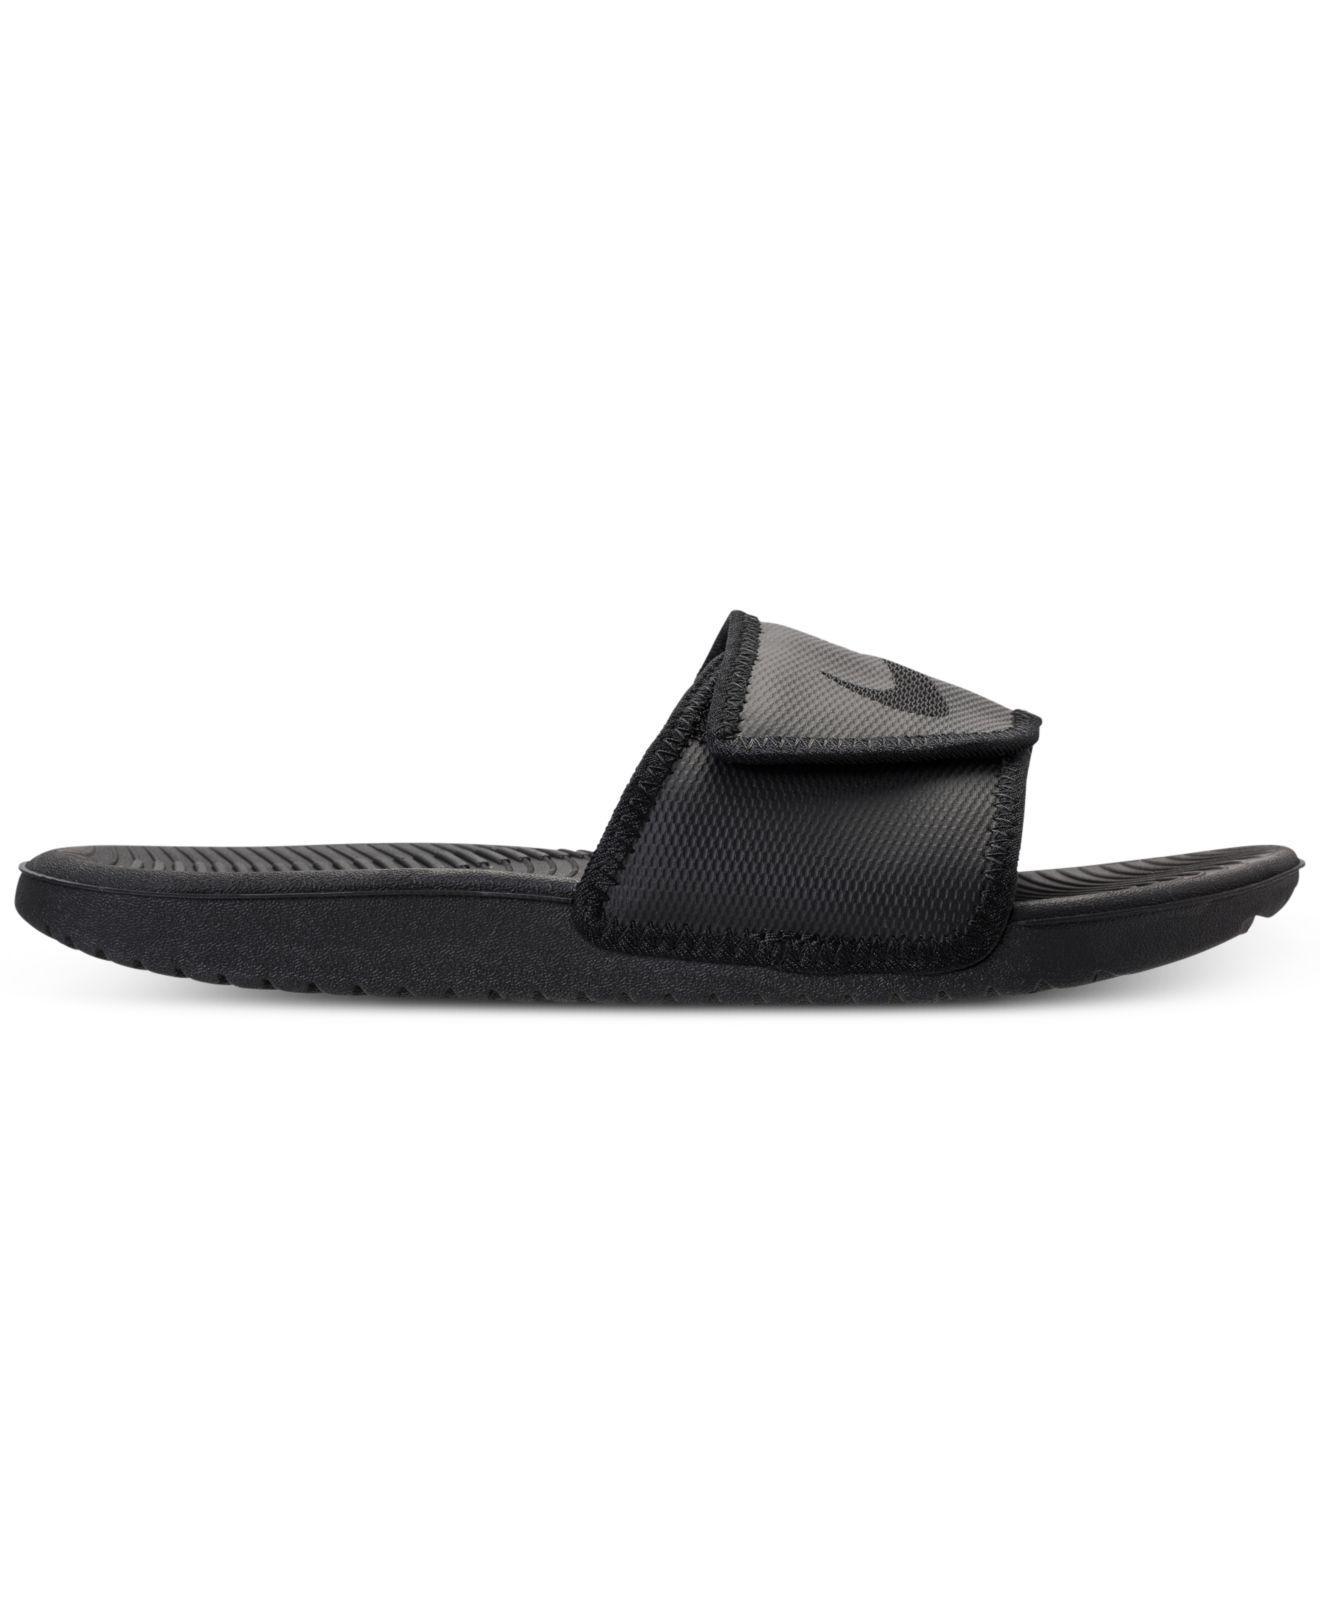 4532ba9d24c8 Lyst - Nike Men s Kawa Adjustable Slide Sandals From Finish Line in Black  for Men